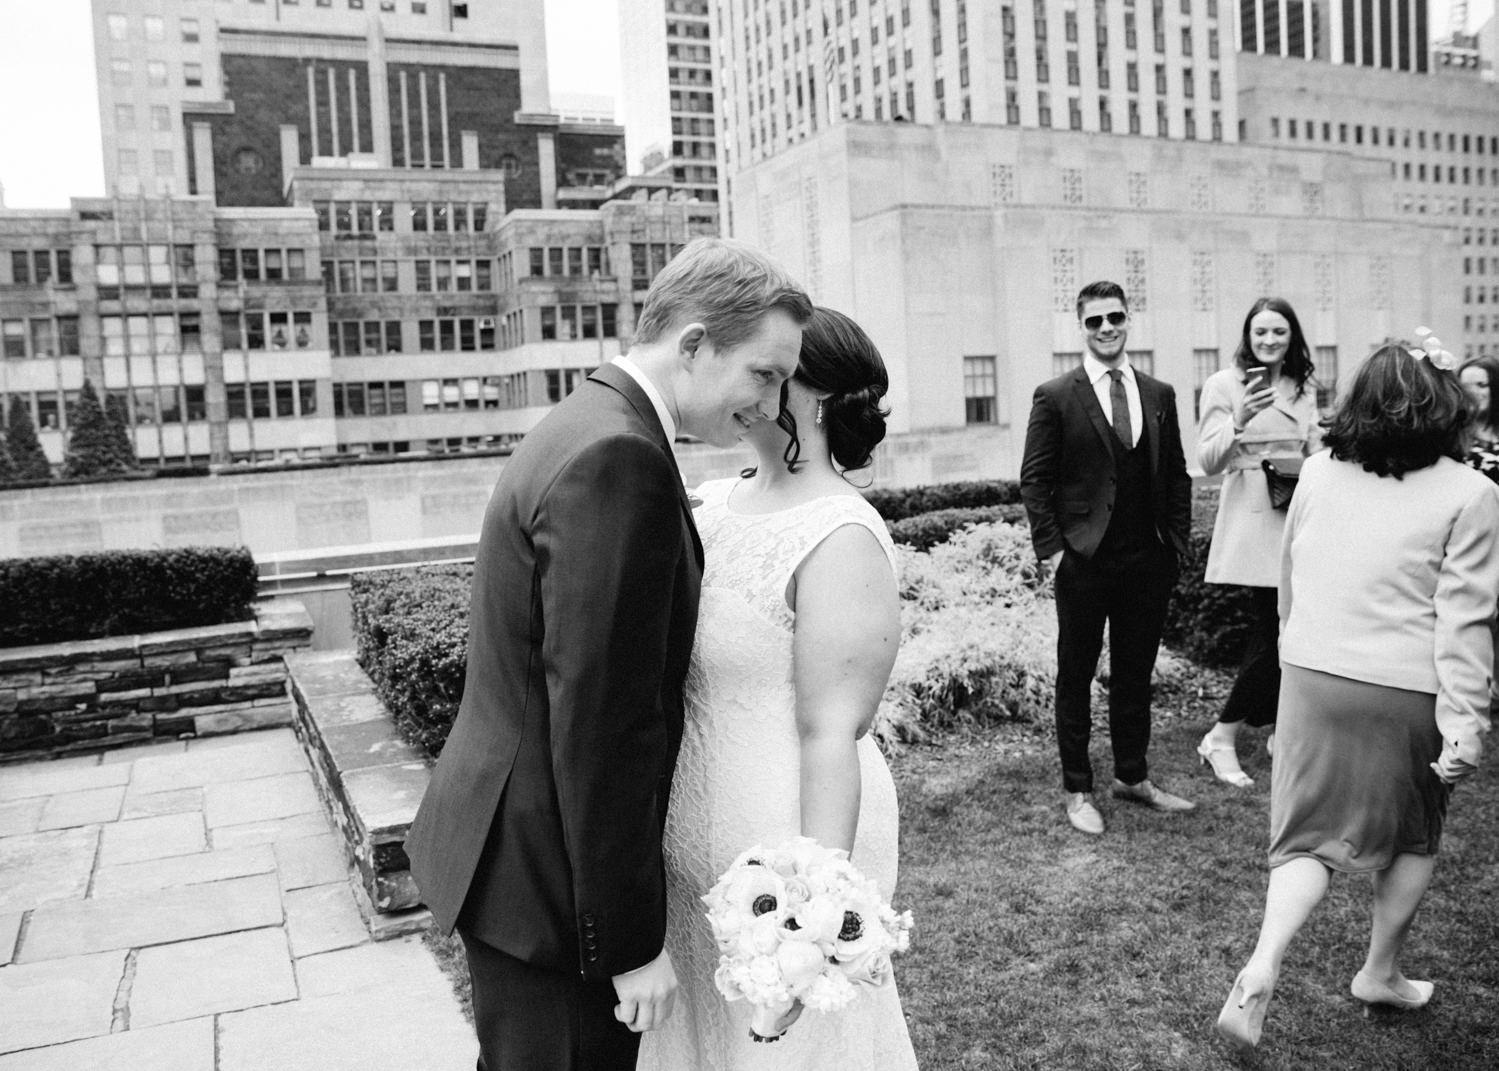 620-loft&garden-intimate-wedding-J&A-38.jpg